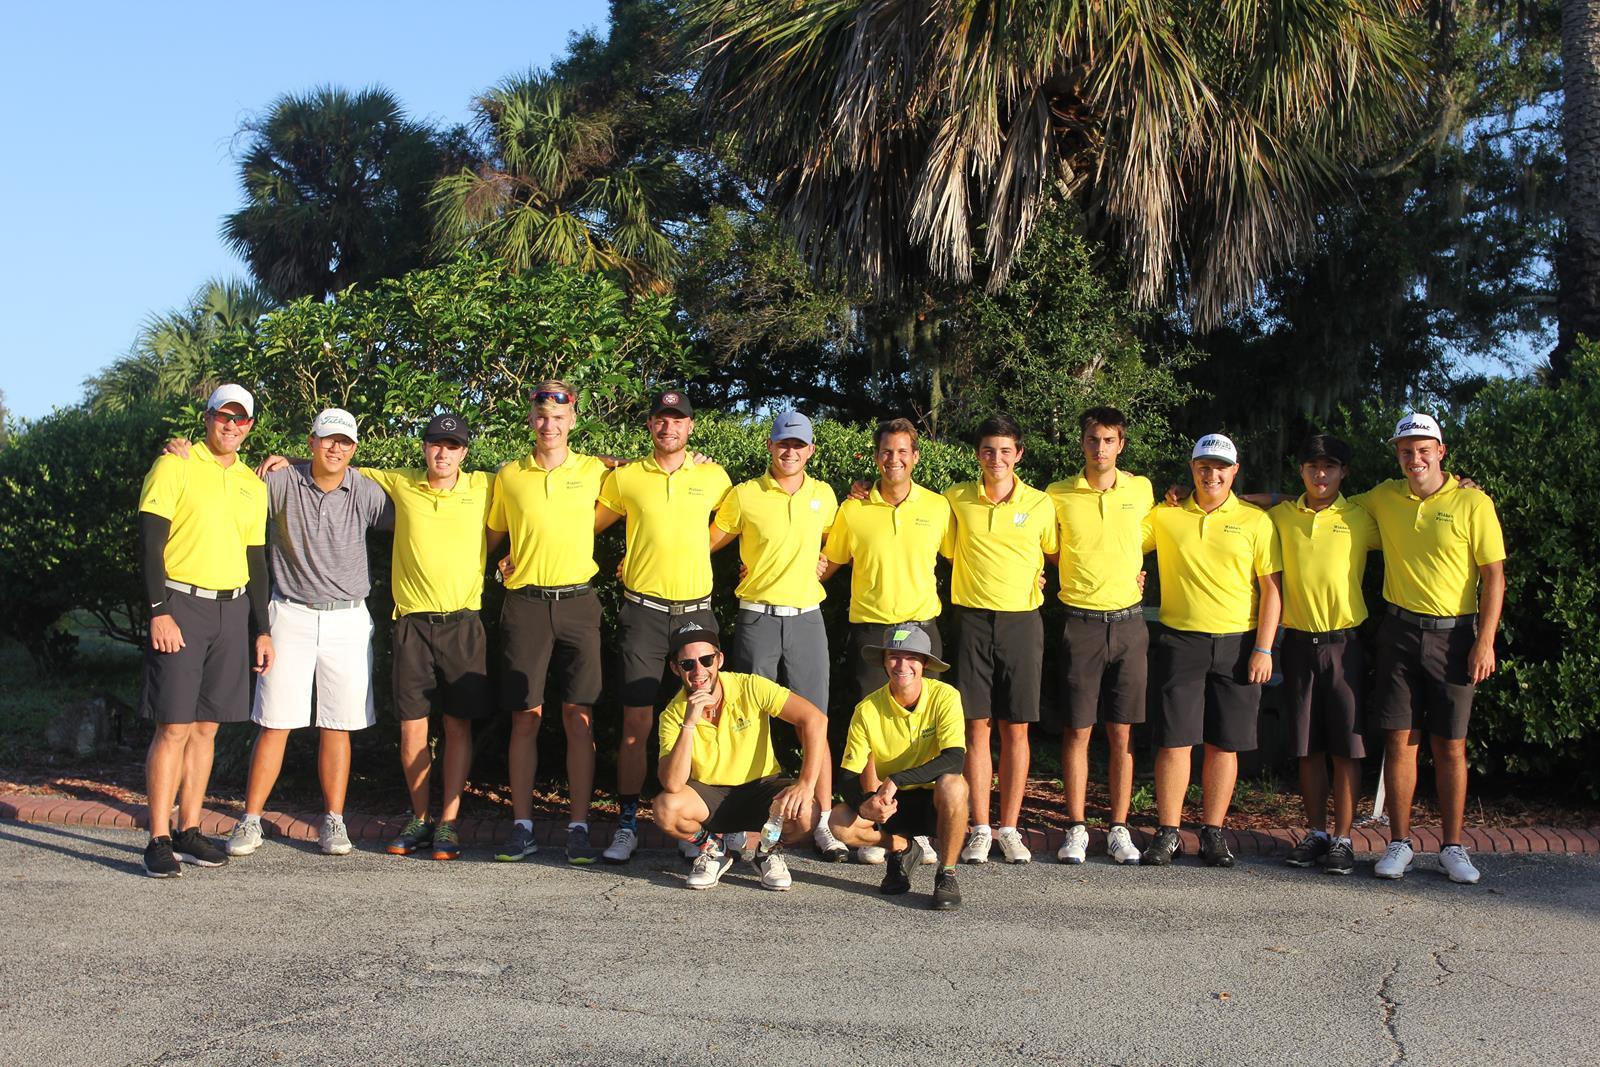 Nickolas Morgan  201920  Men'S Golf  Webber with Haines City High School Calendar